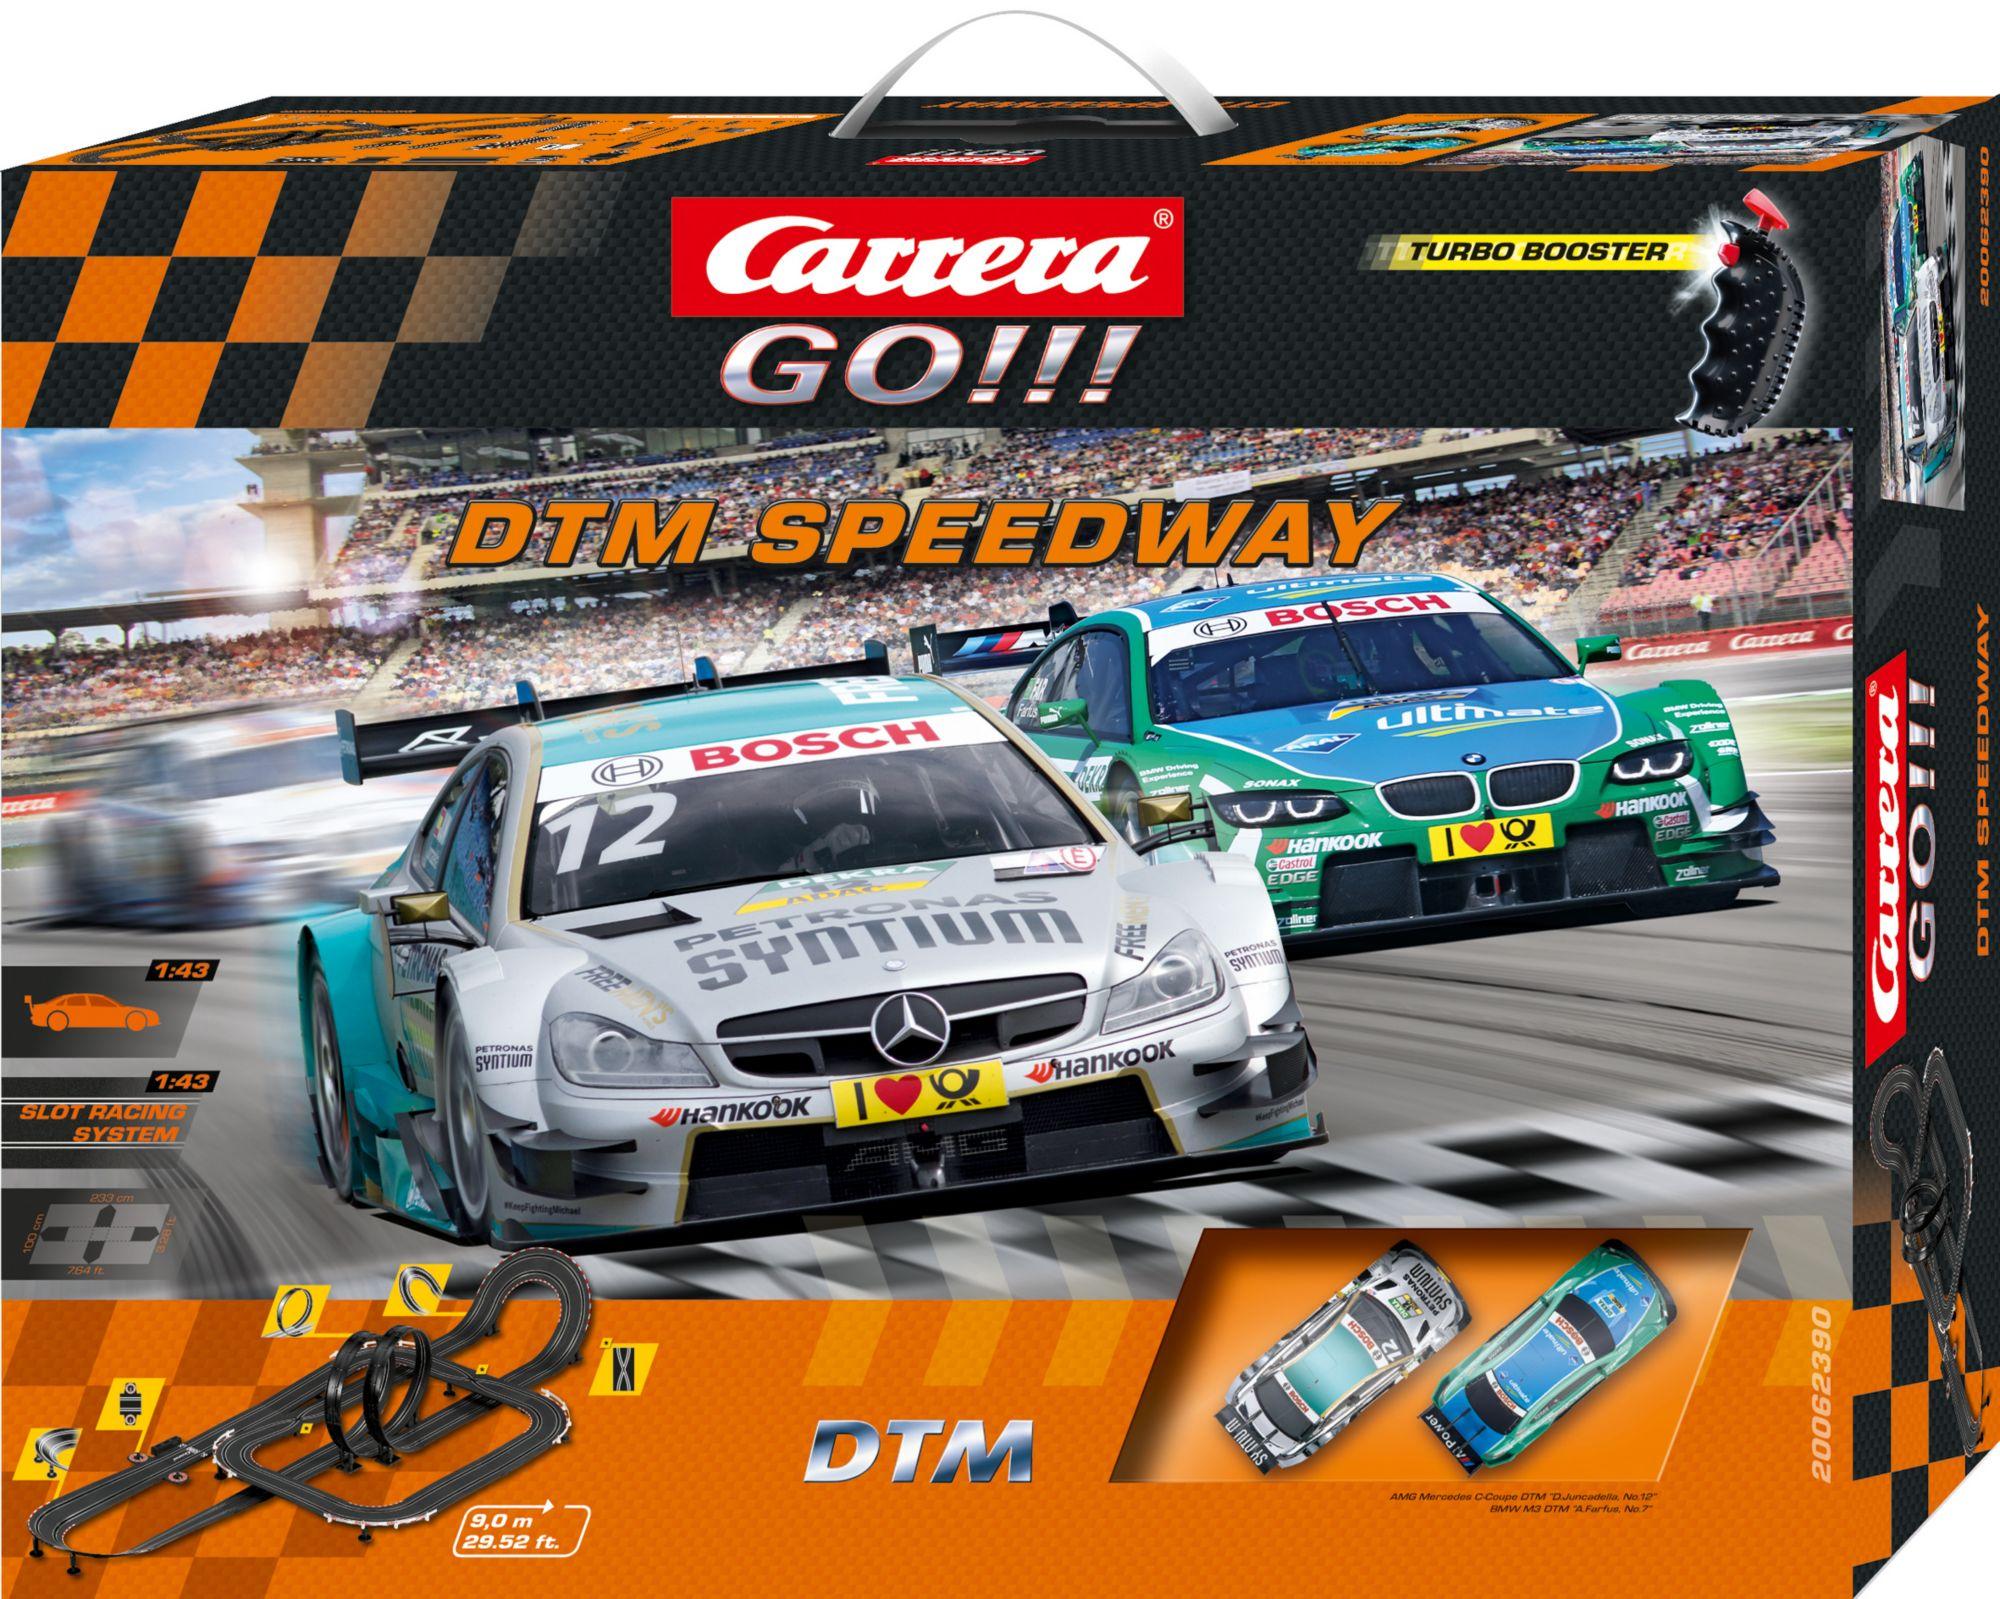 CARRERA Carrera Autorennbahn, »Carrera® GO!!! DTM Speedway«